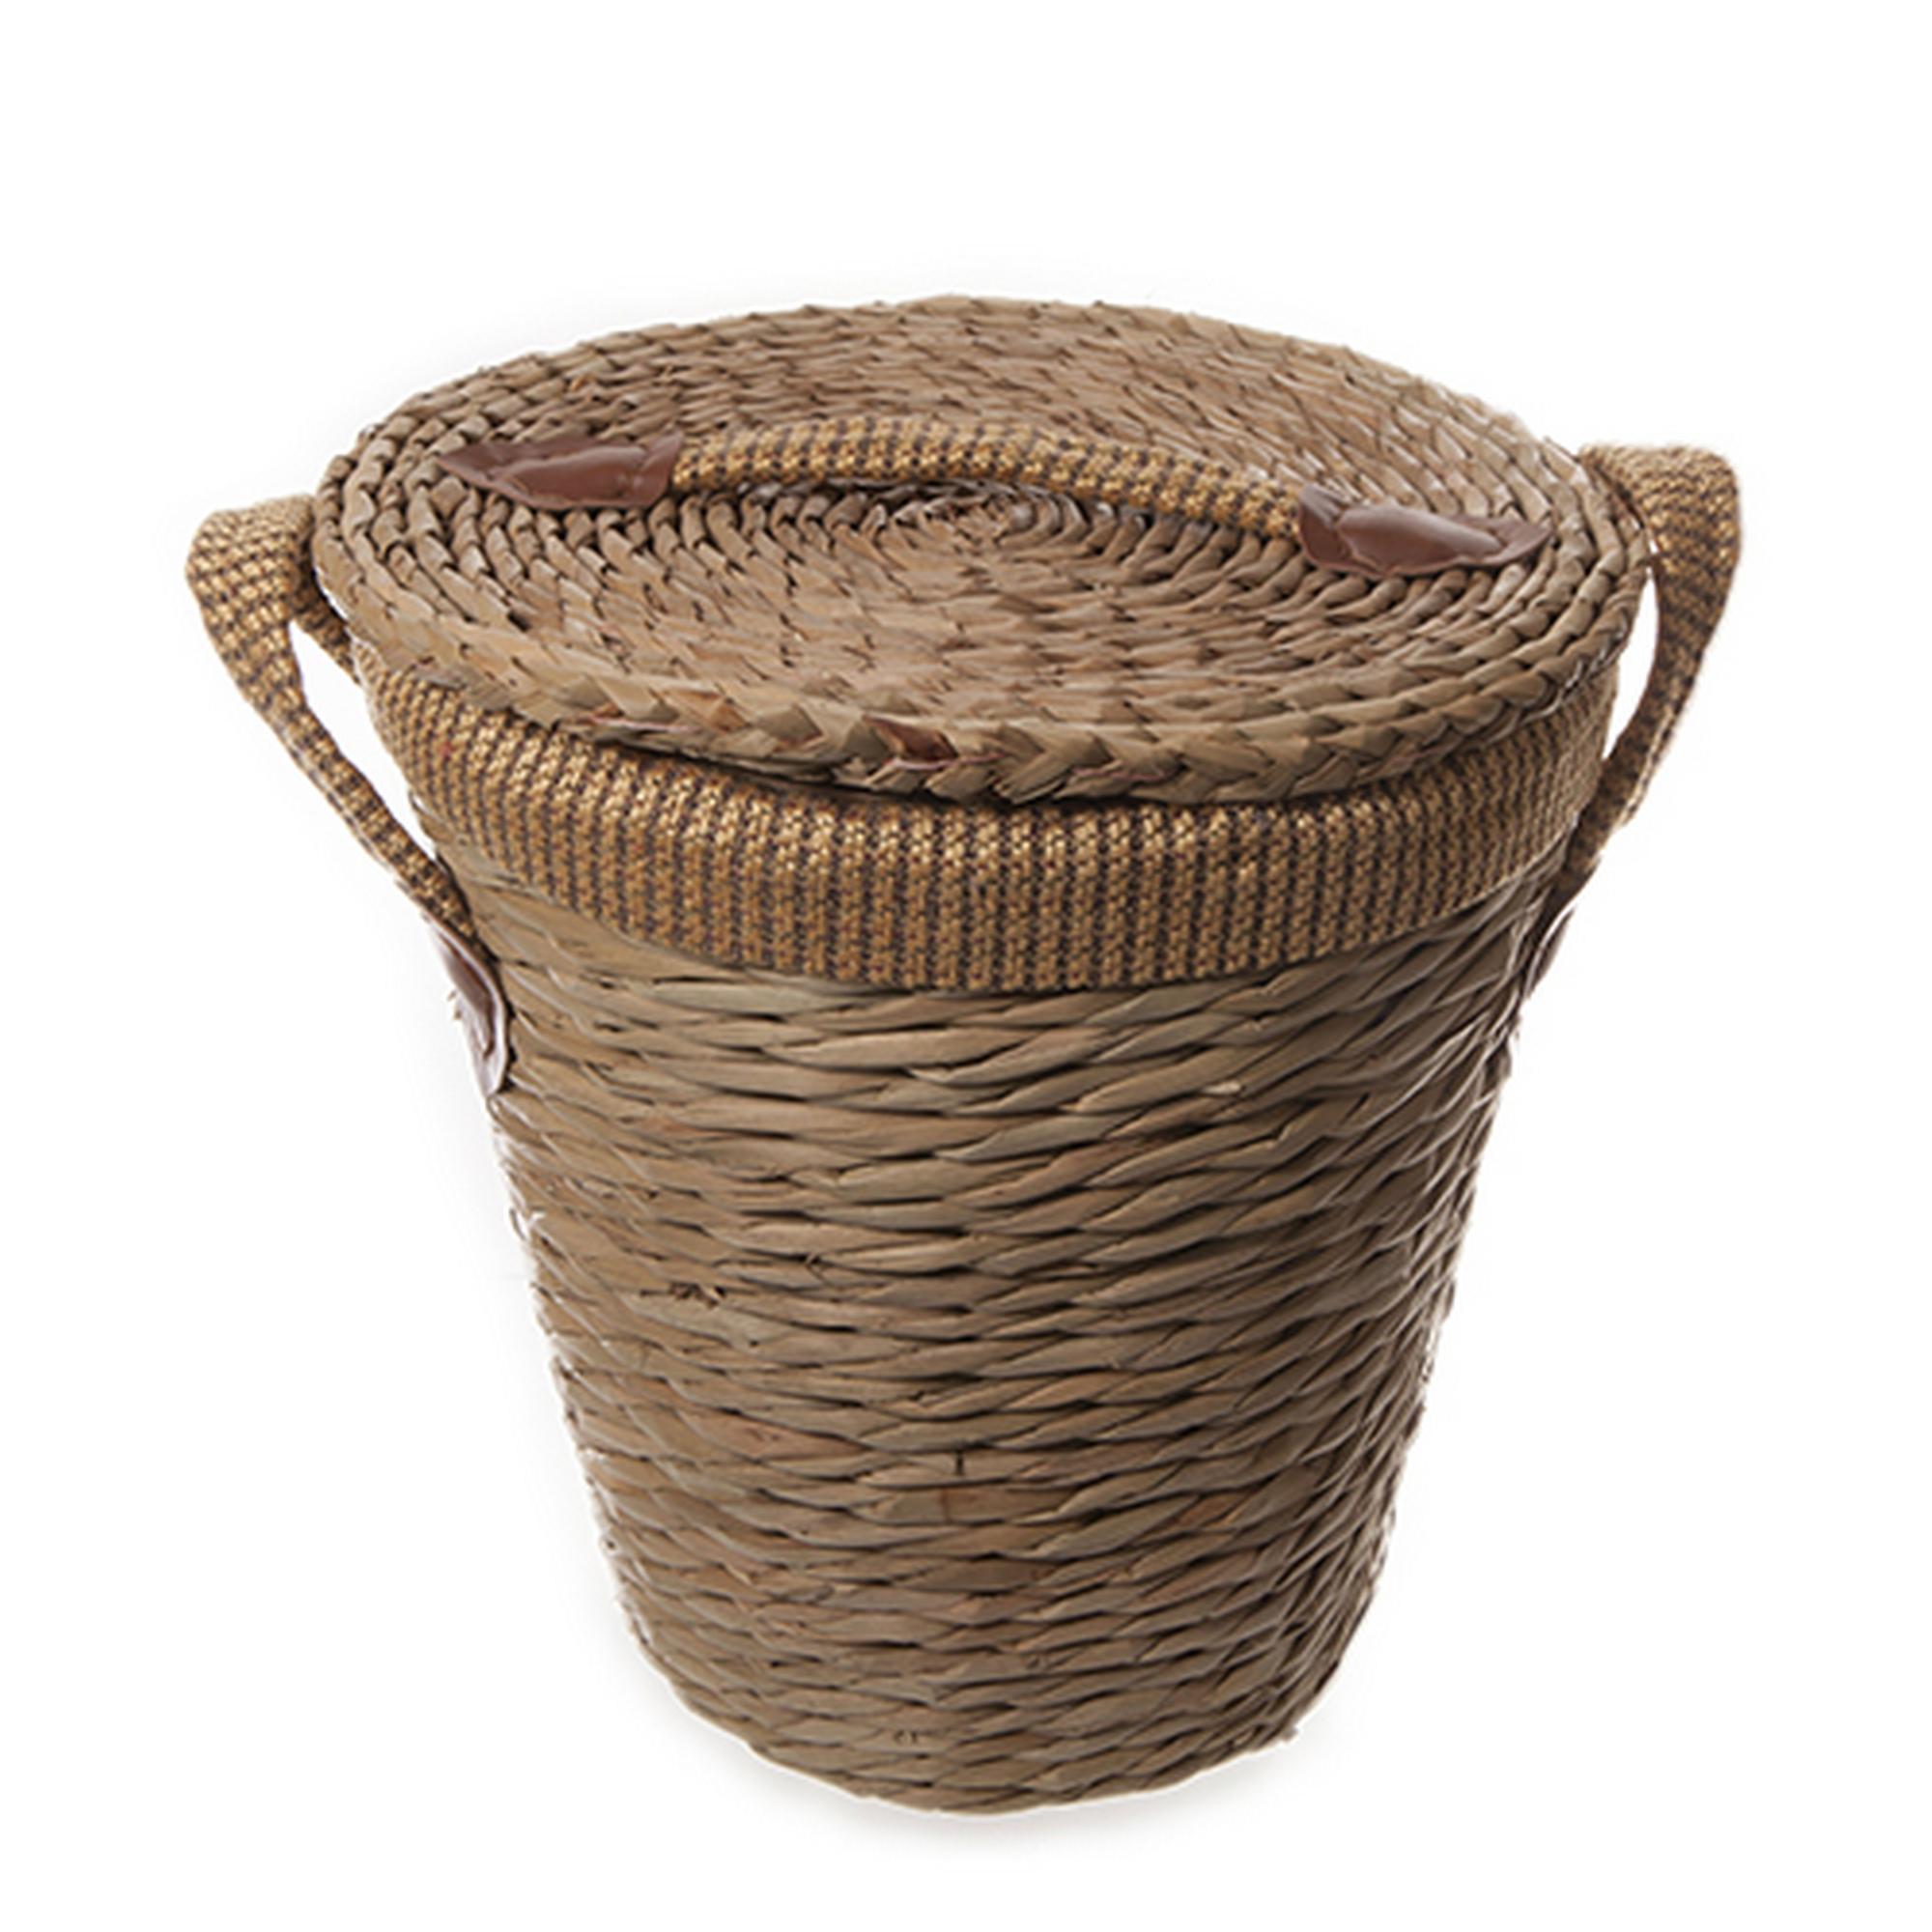 Elegant  About Wicker Corner Laundry Basket With Lid  Linning Bathroom Storage